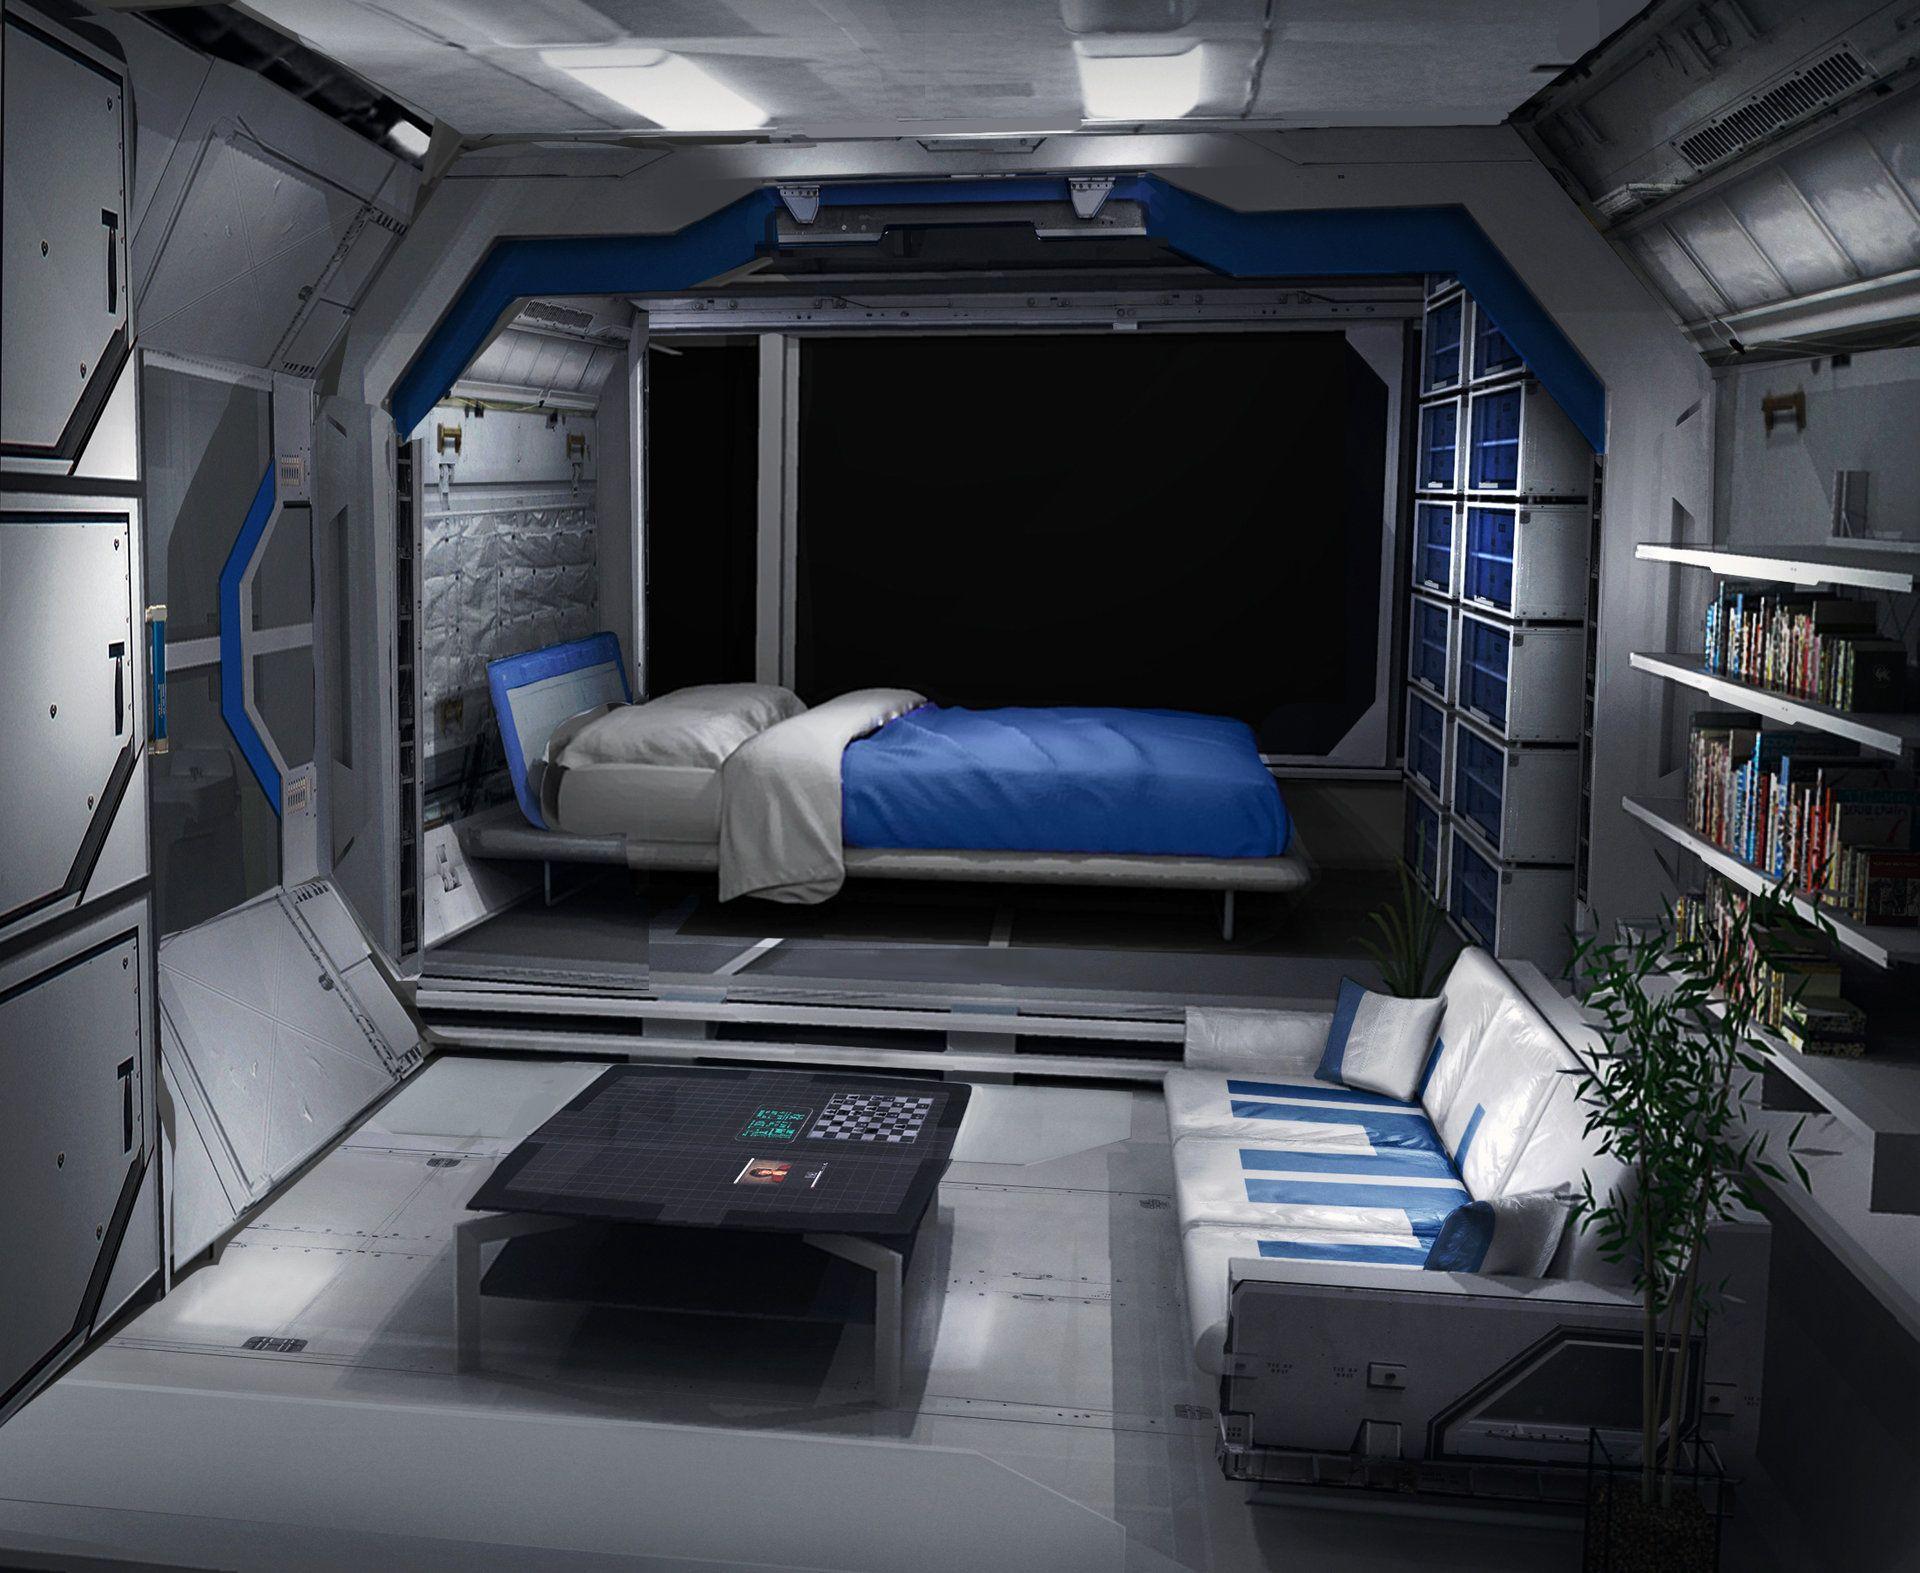 pingl par duart sur me imagenes de ciencia ficcion. Black Bedroom Furniture Sets. Home Design Ideas